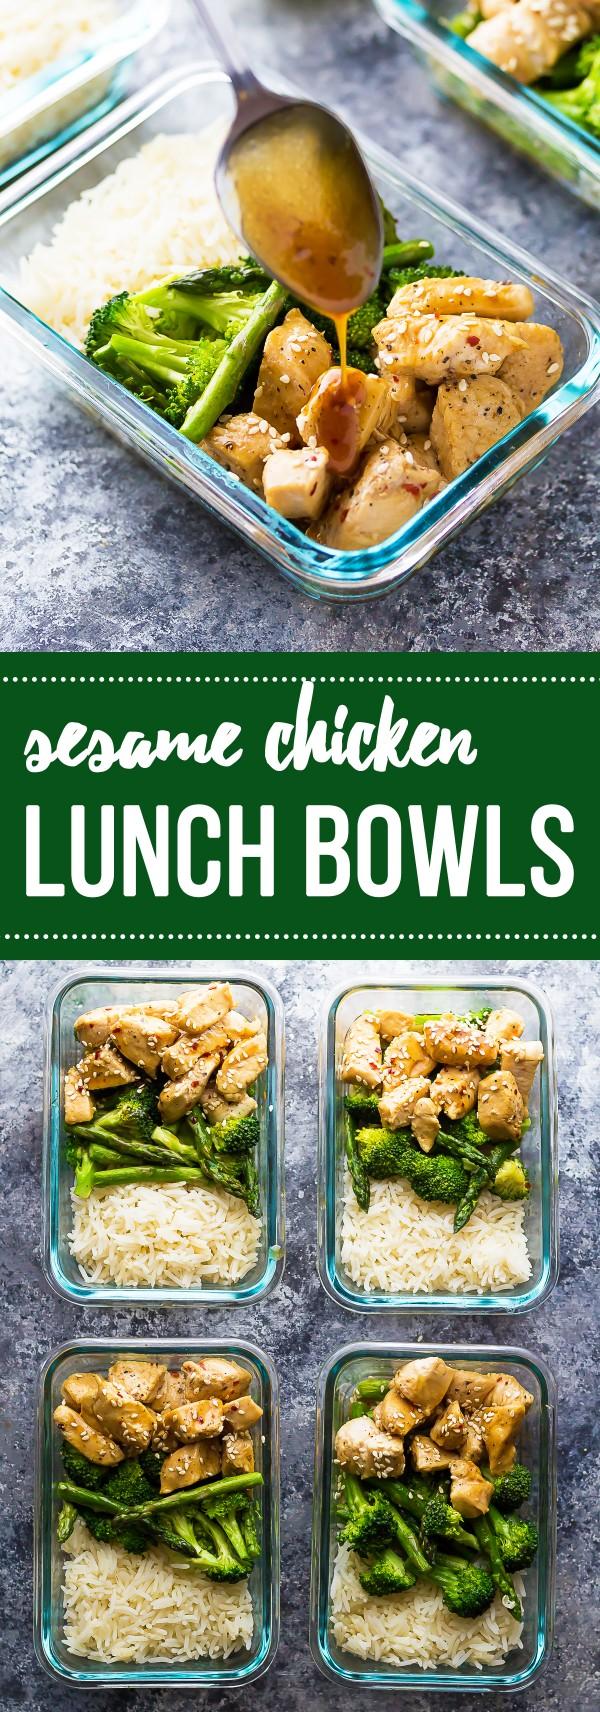 Get the recipe Sesame Chicken Lunch Bowls @recipes_to_go